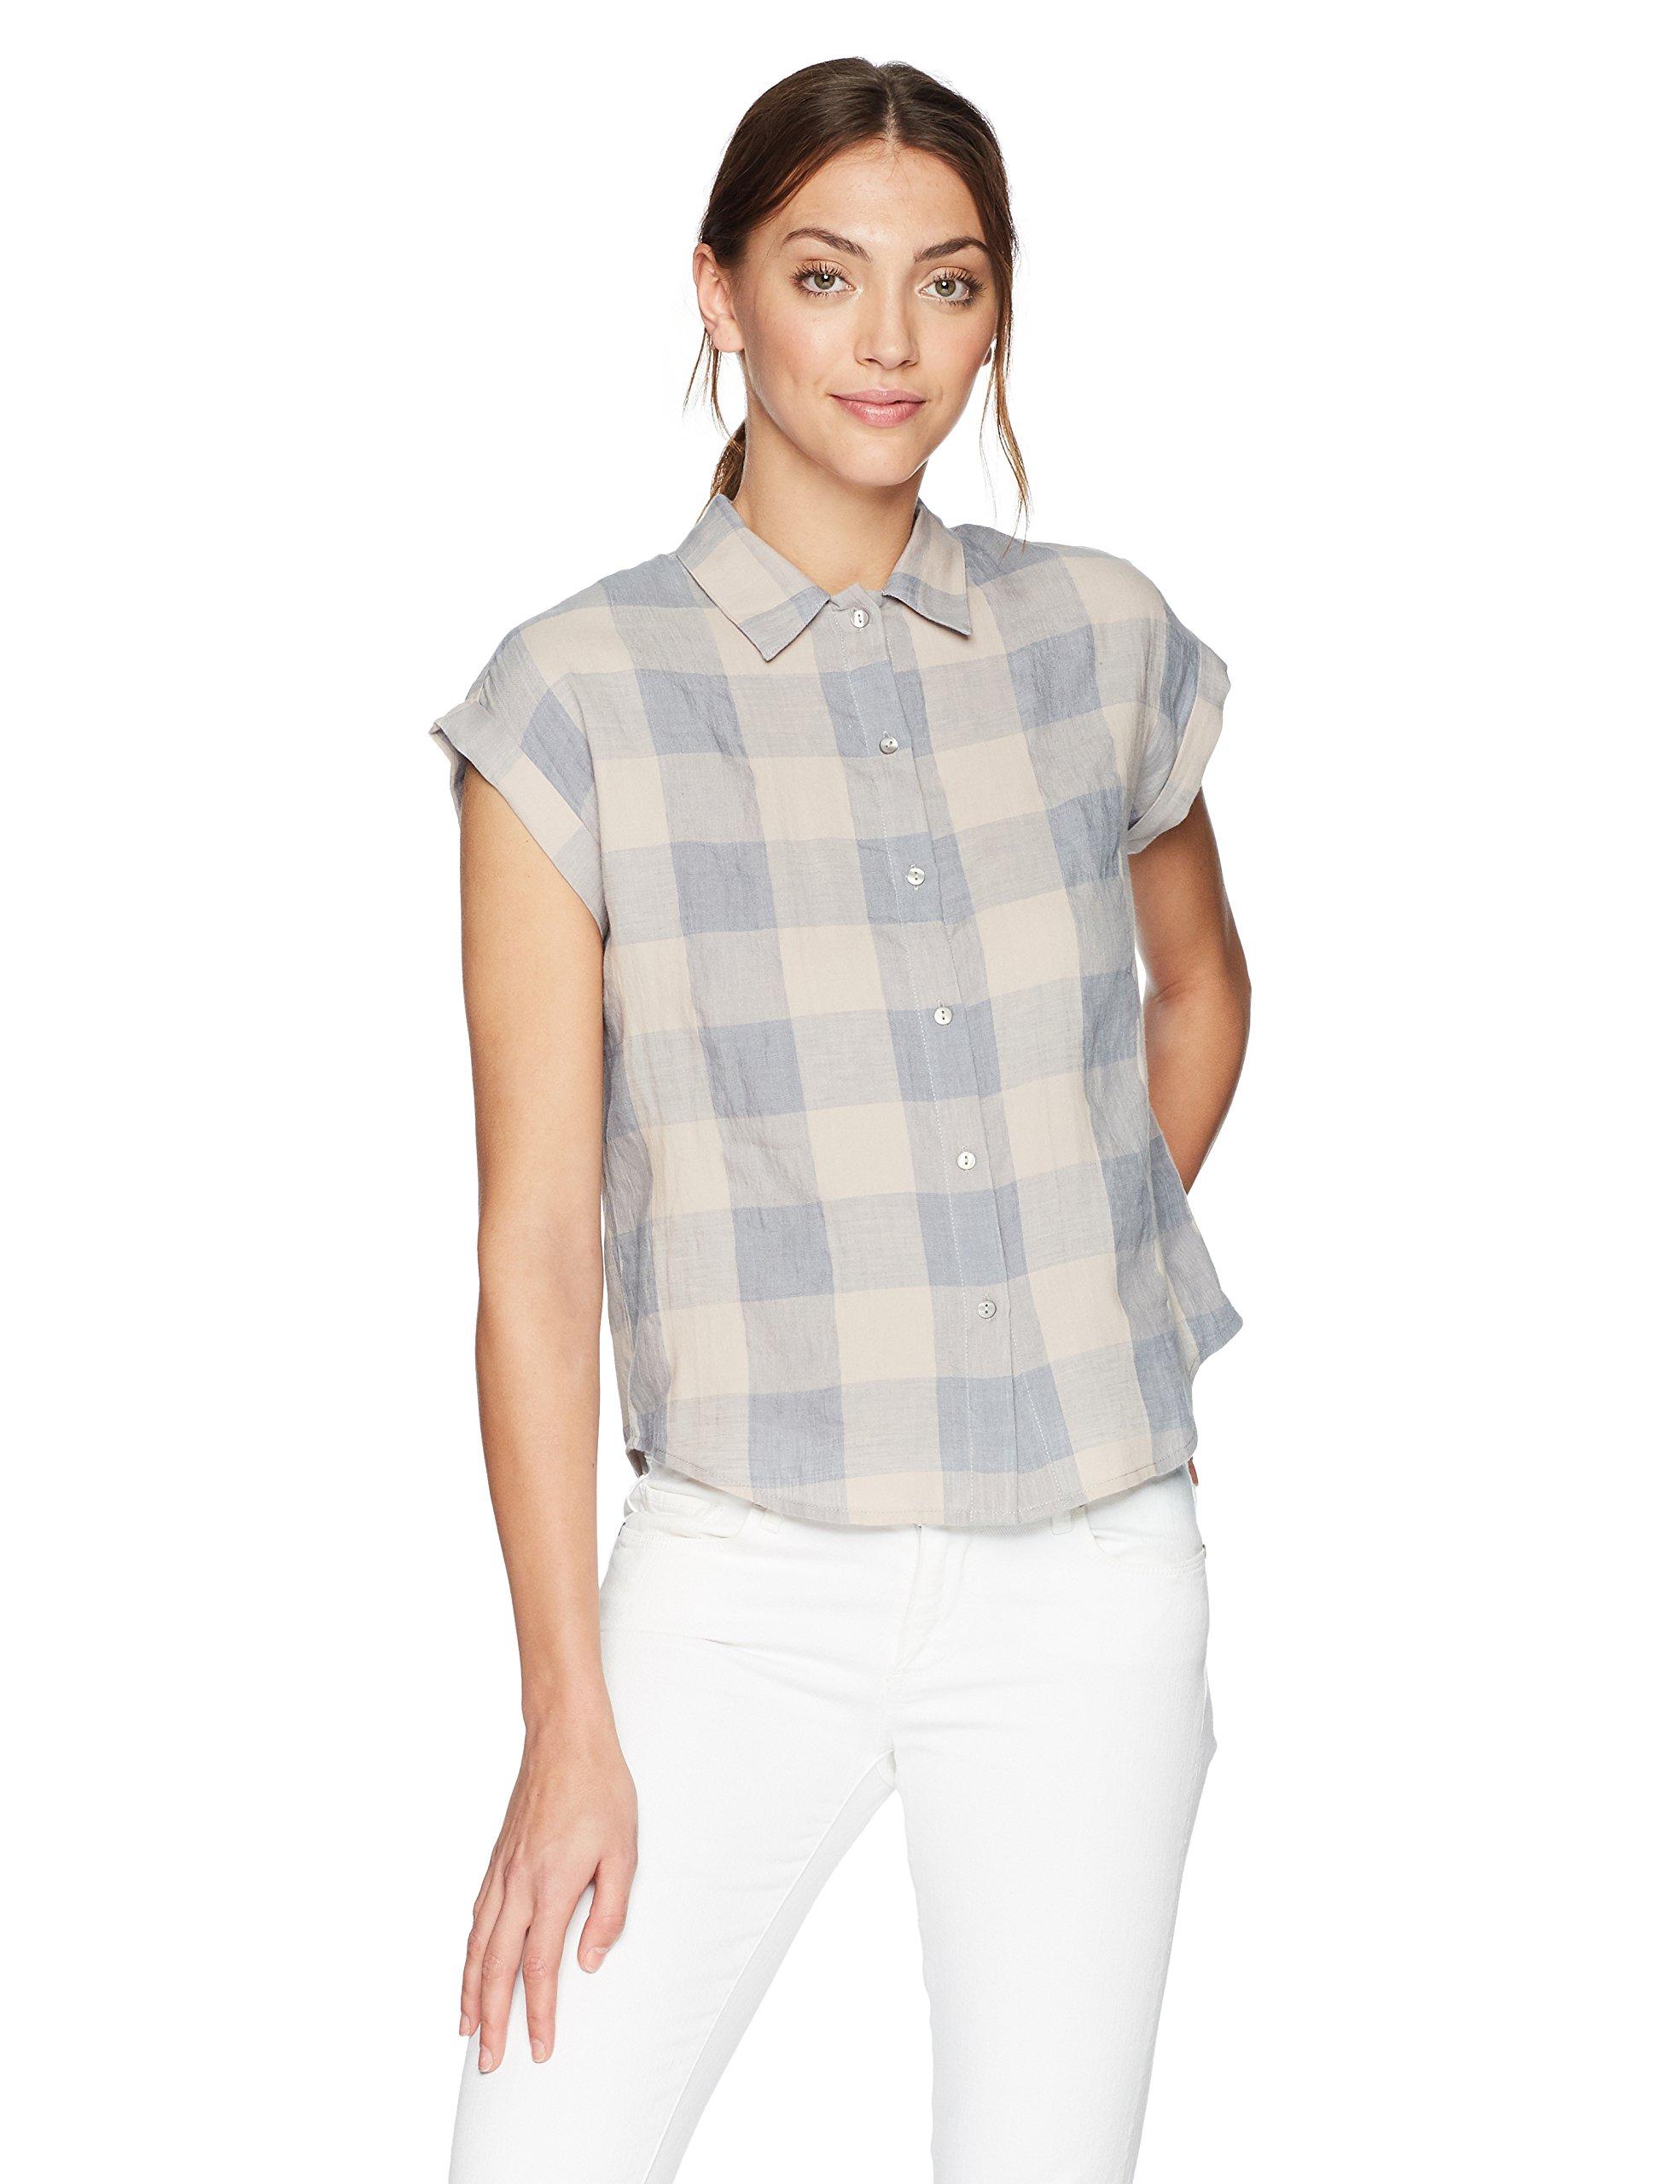 Lucky Brand Women's Short Sleeve Button up Plaid Top, Blue/Multi, S